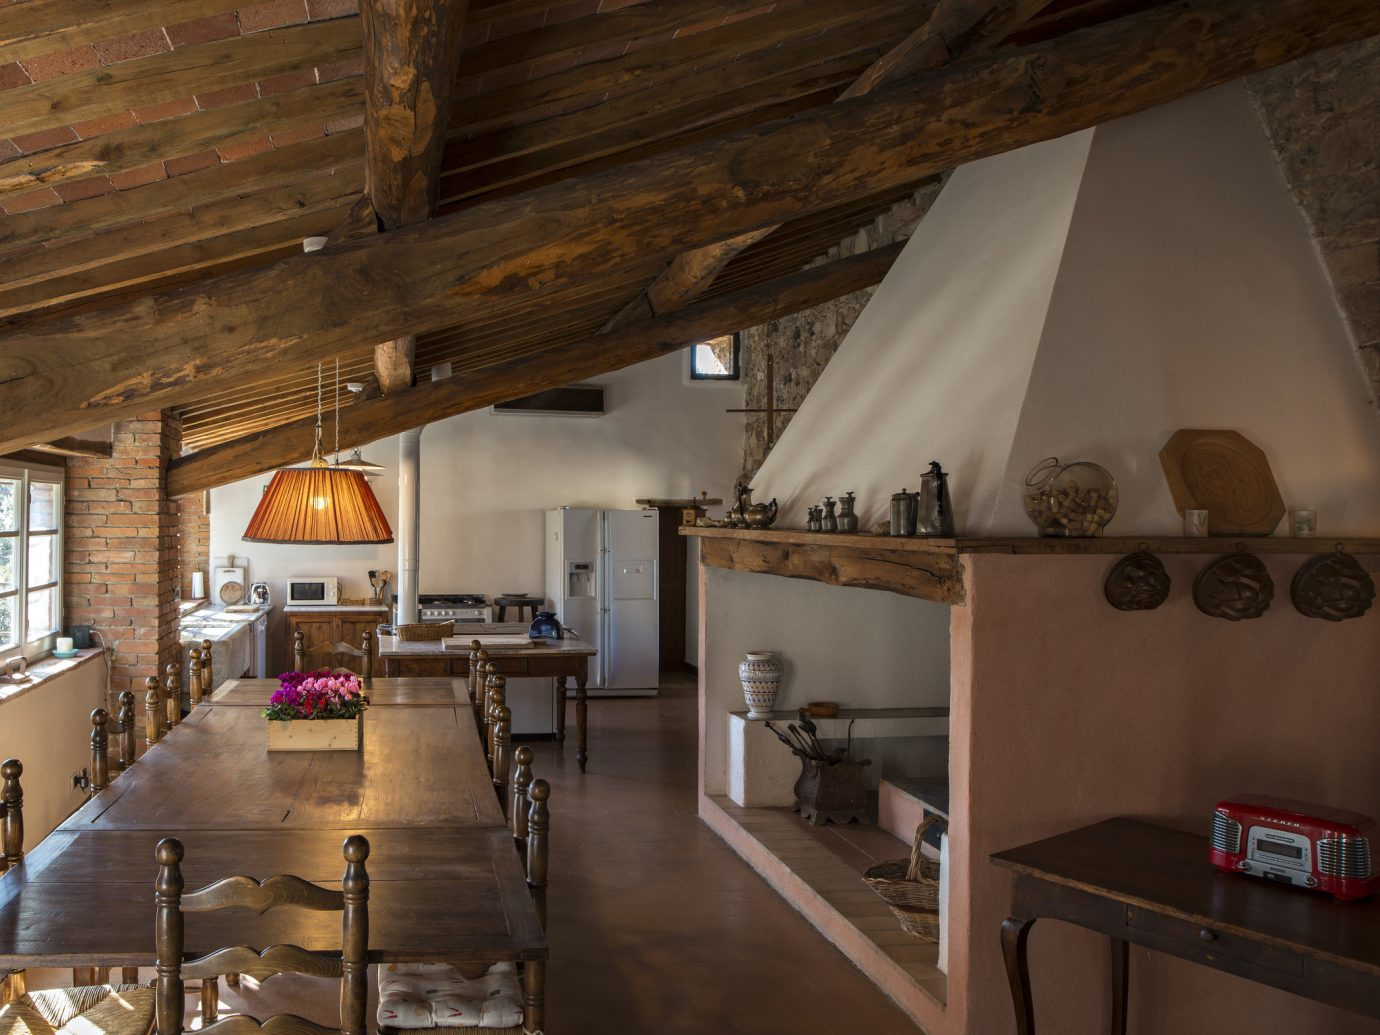 Hotels Luxury Travel indoor wall ceiling room interior design beam loft area furniture